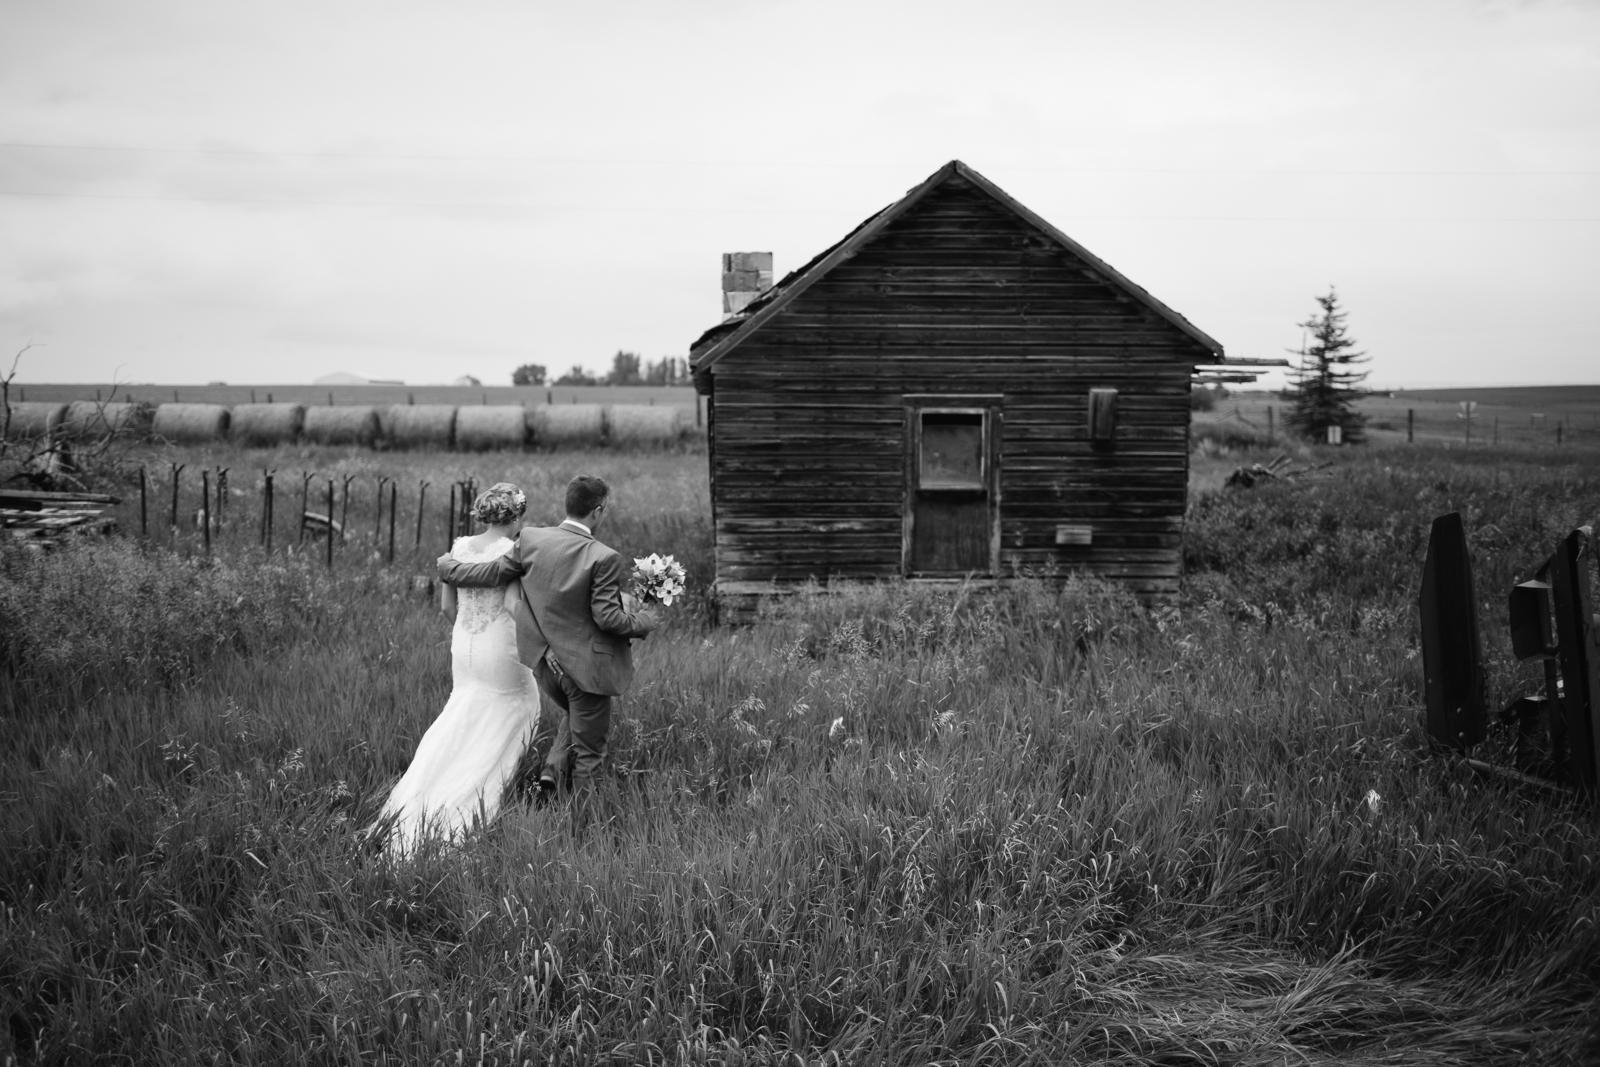 169Andrew_Pavlidis_Photography_Bec_and_BJ_Wedding_Calgary_Portraits_DNG-112222